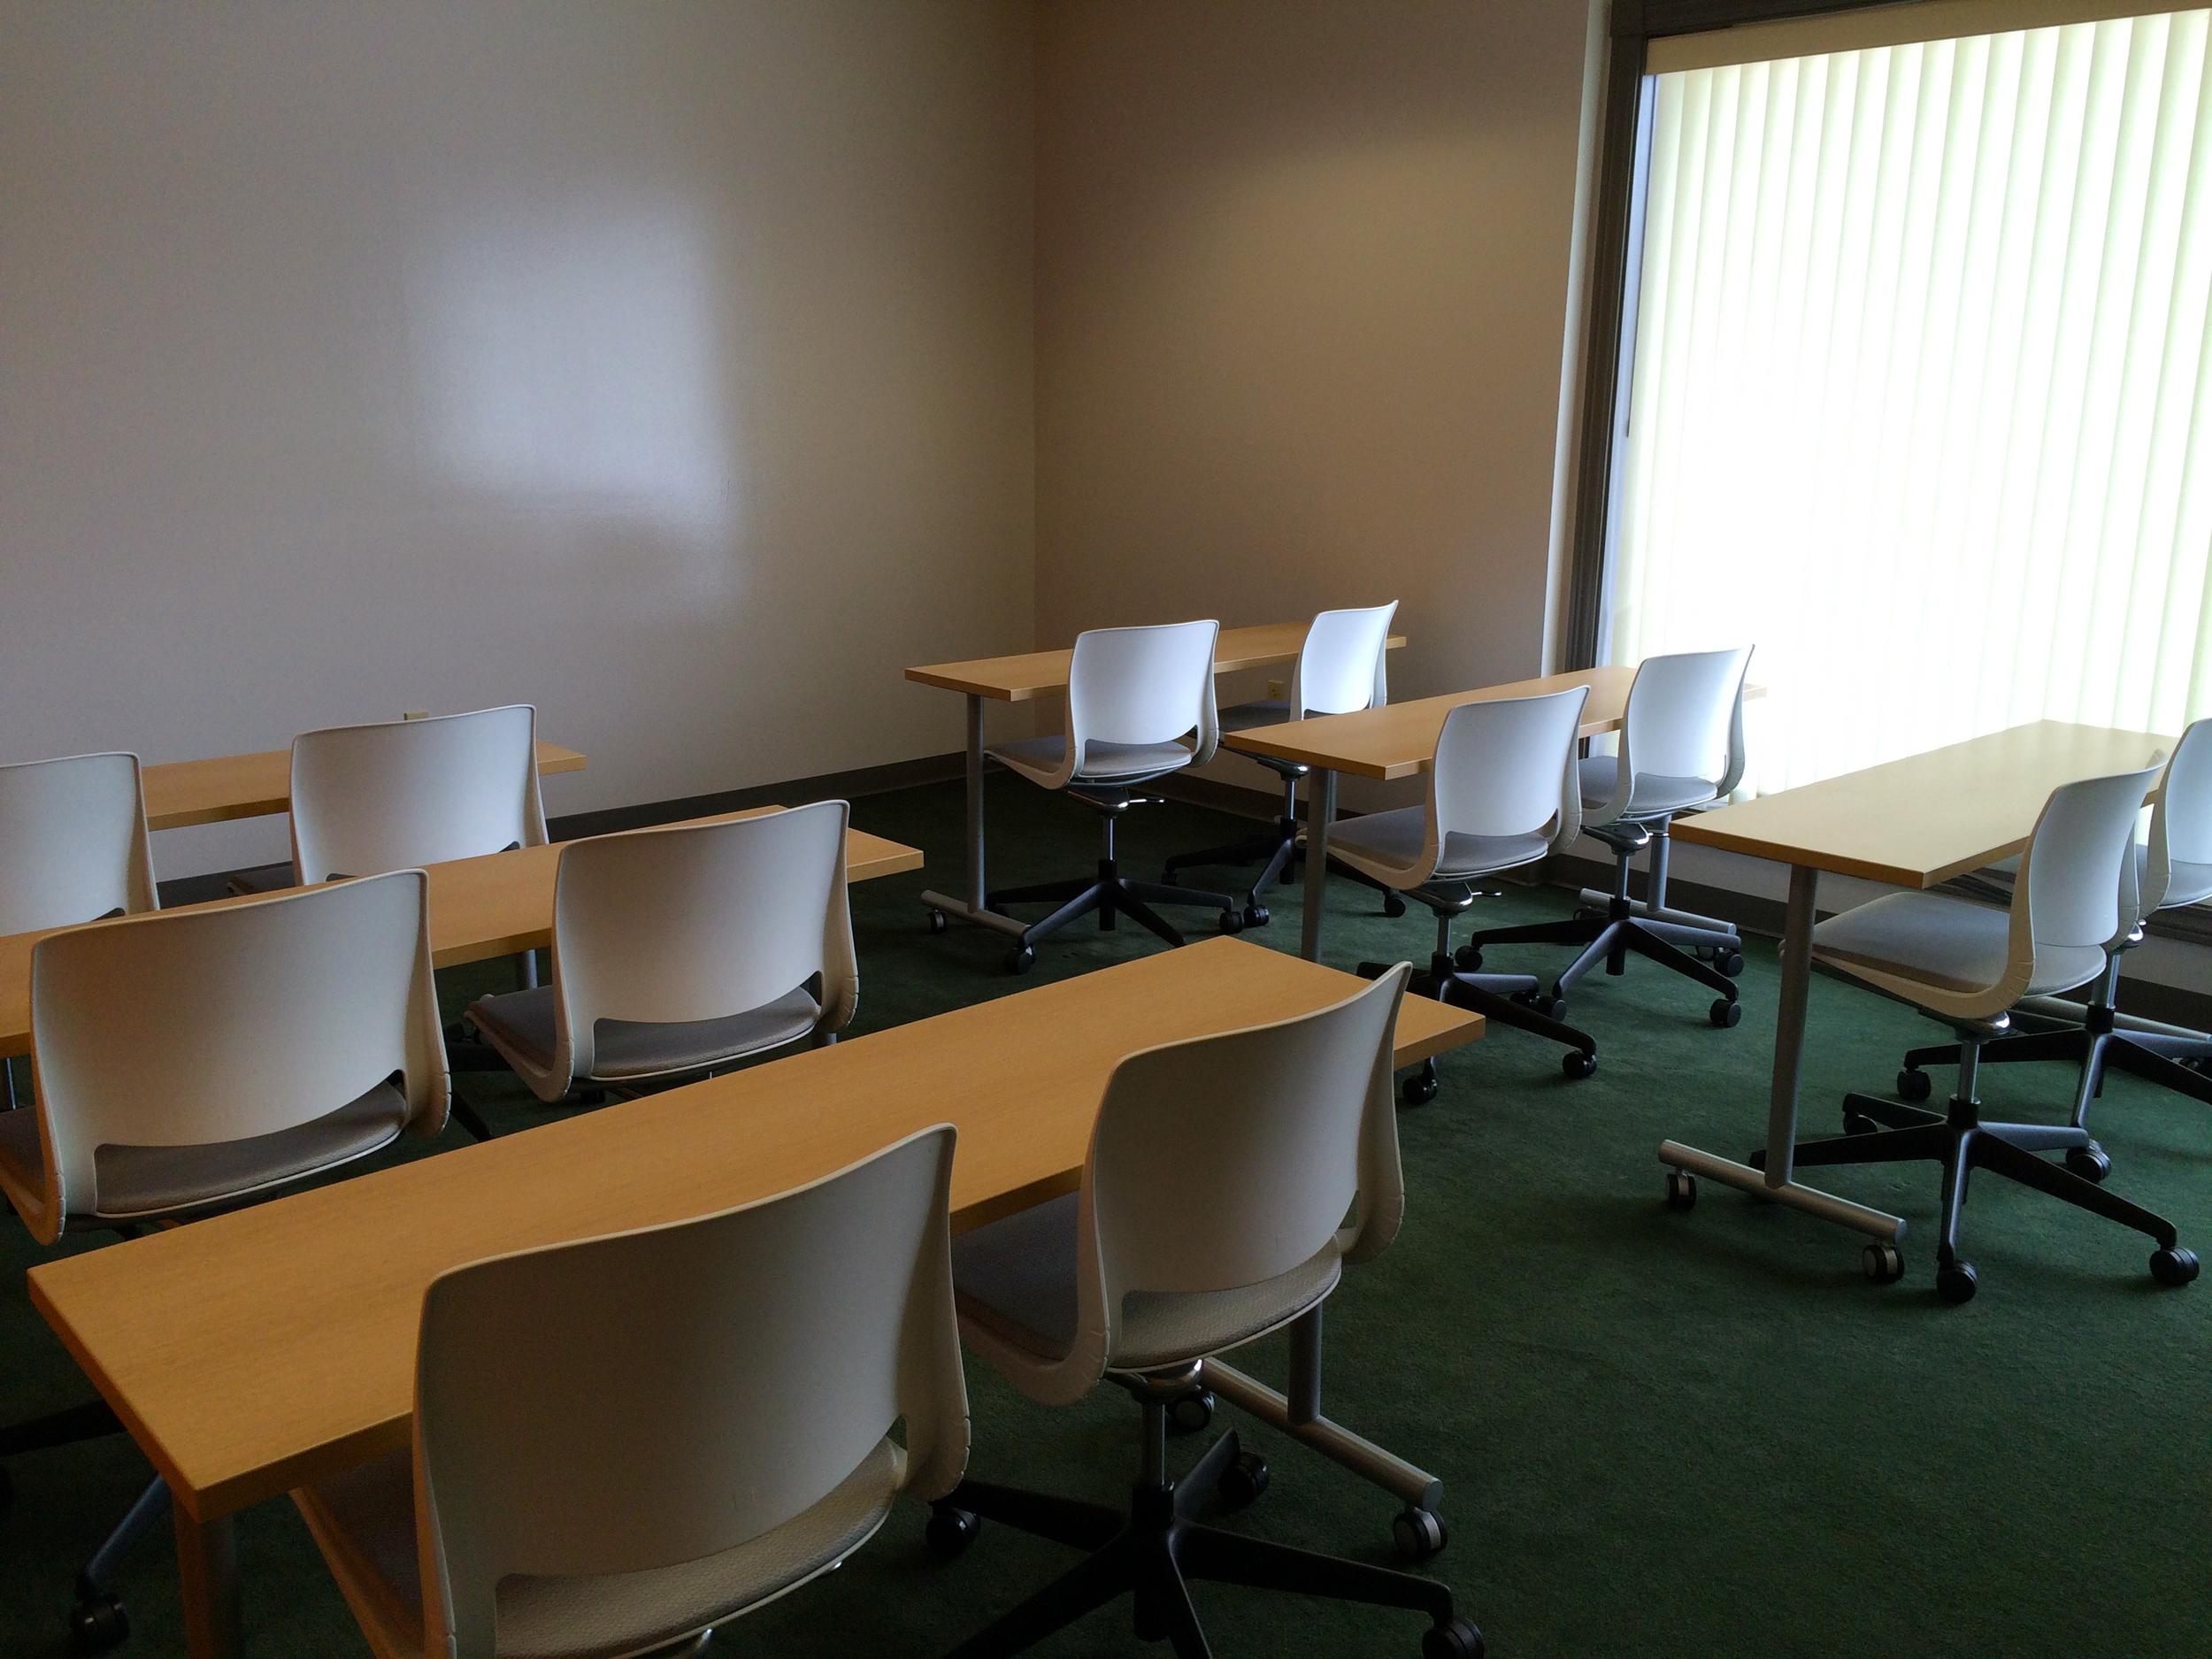 Classroom Rows